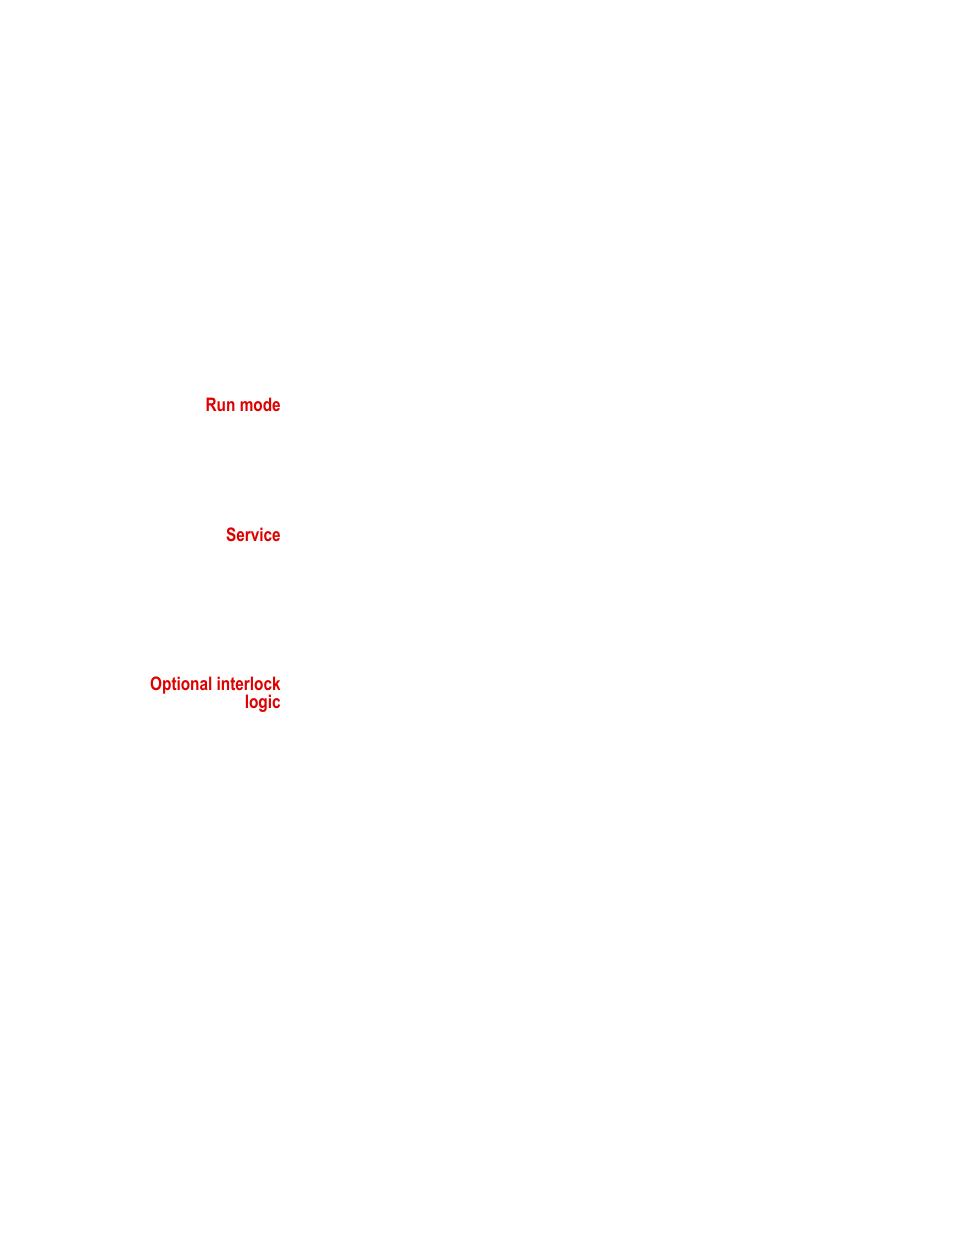 Run Mode Service Optional Interlock Logic Mts Series 311 Load Wiring Diagram 4 Doors Frame User Manual Page 84 86